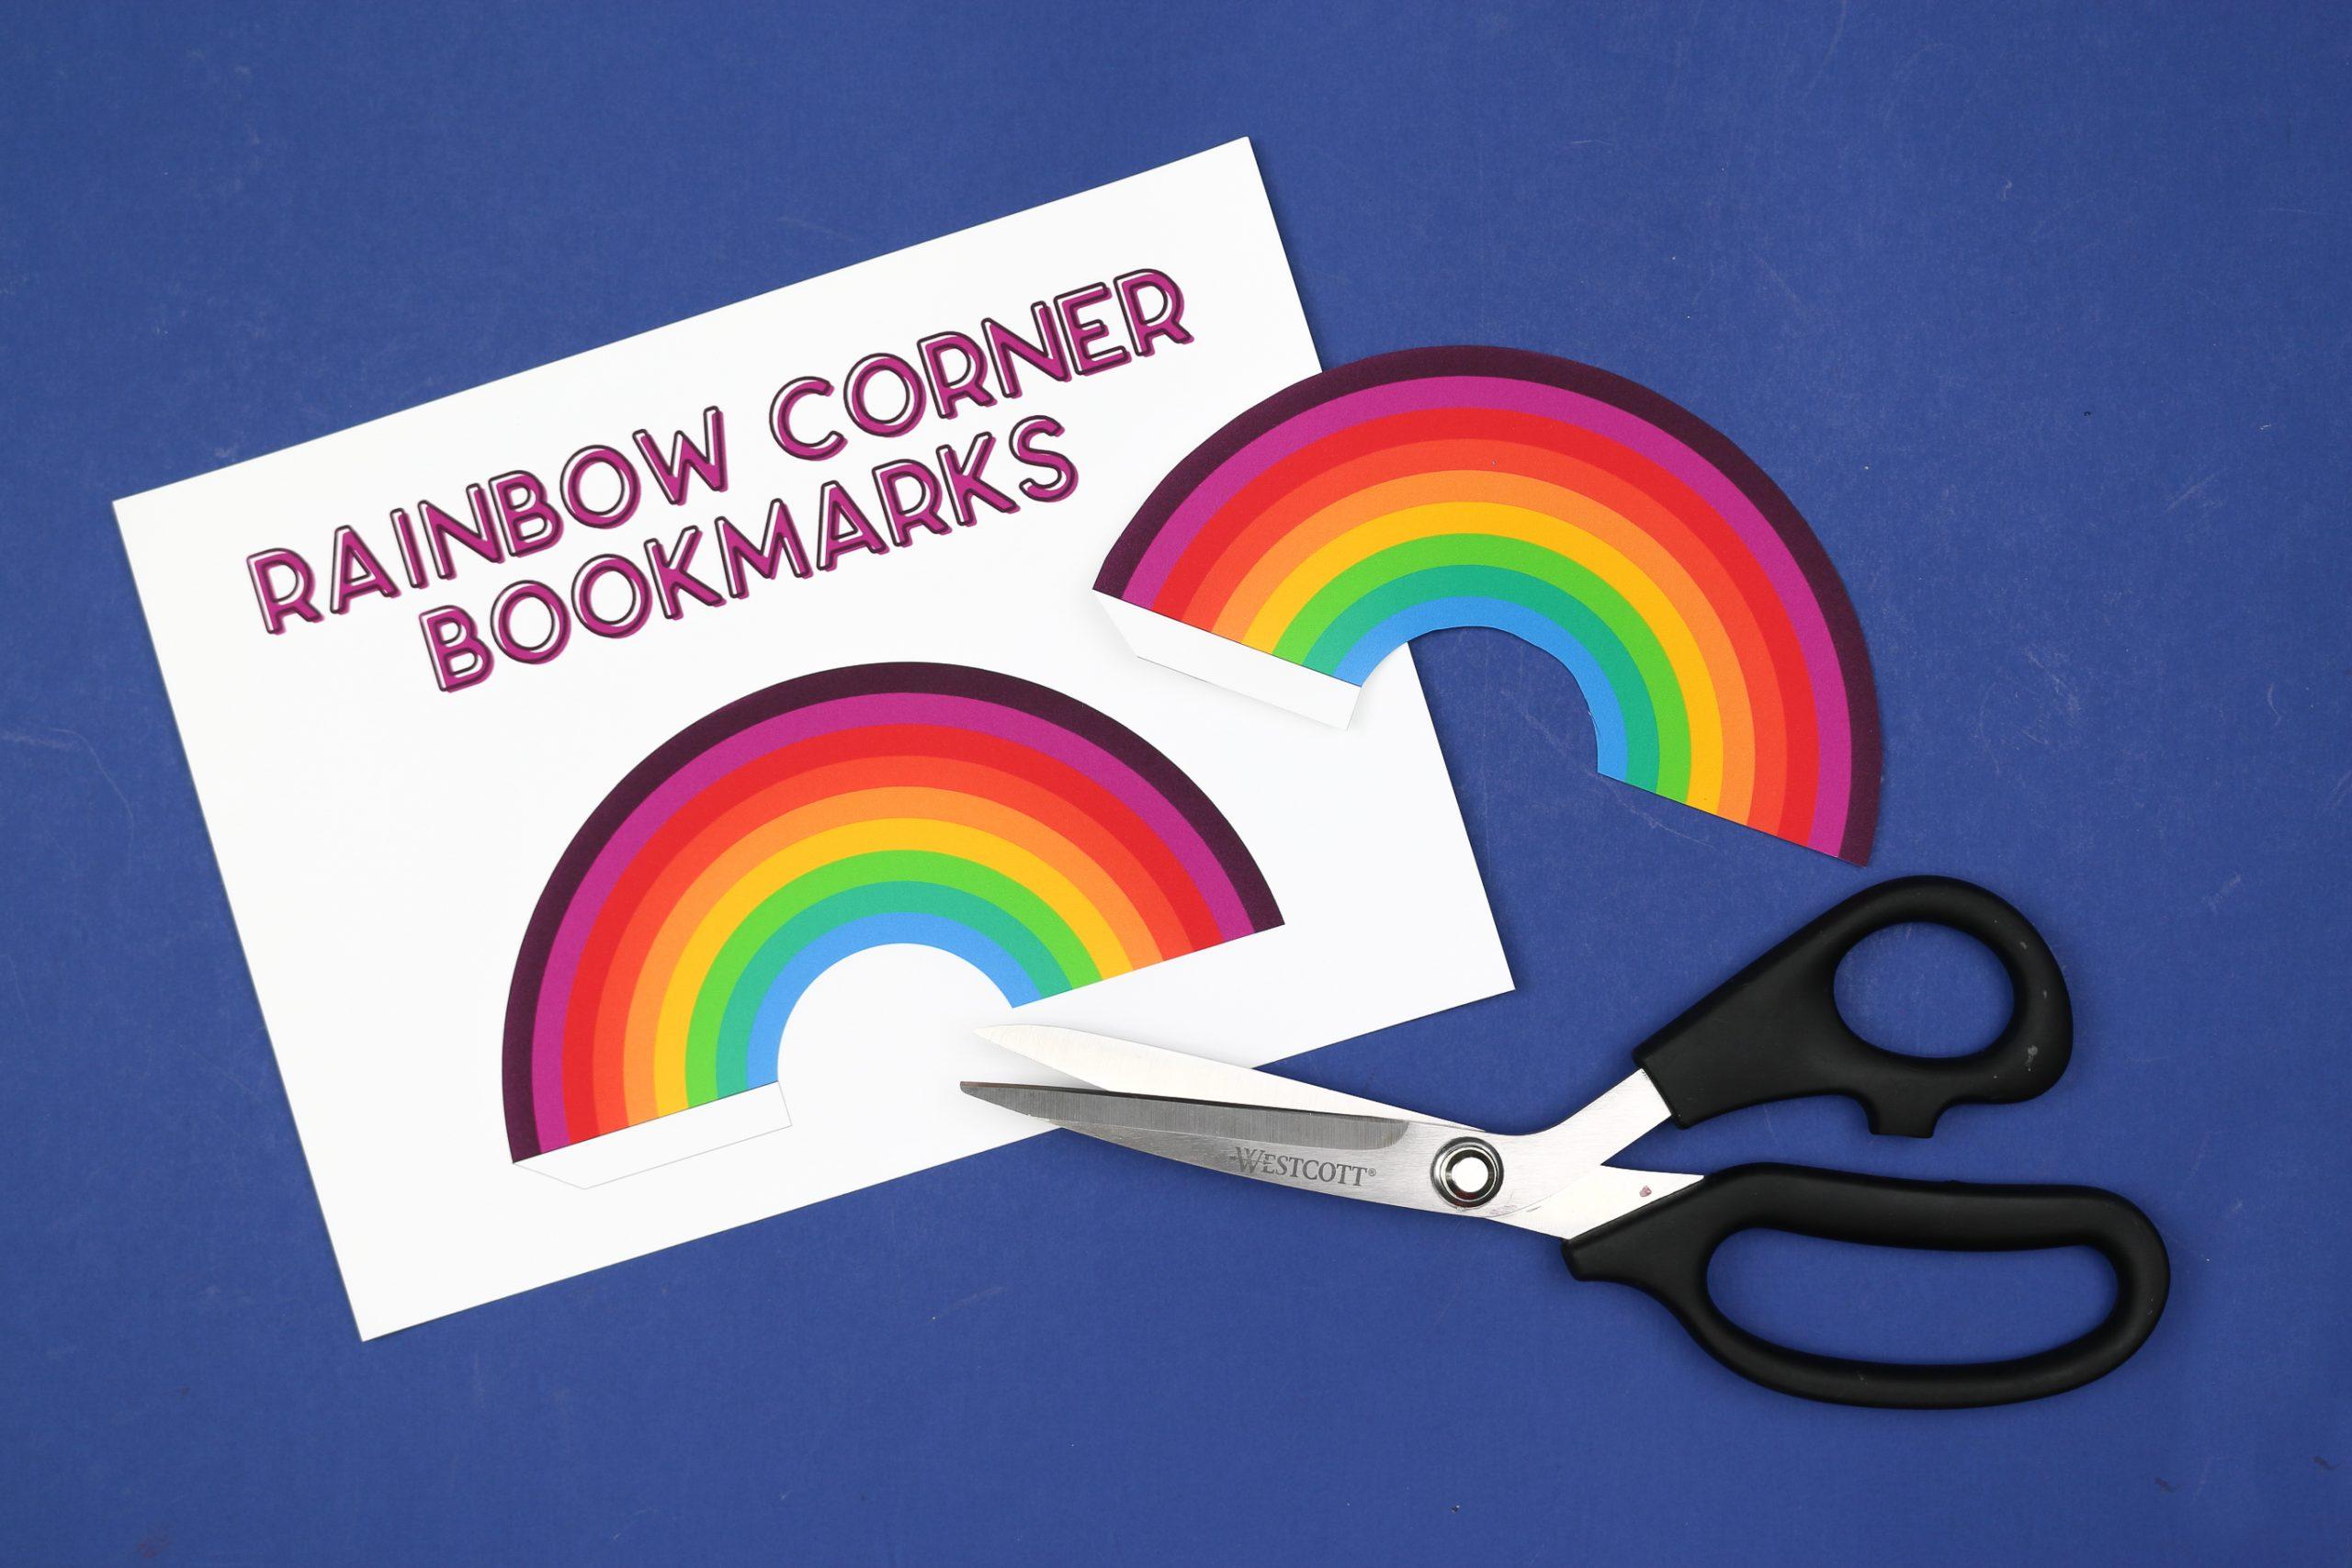 scissors and rainbow bookmarks